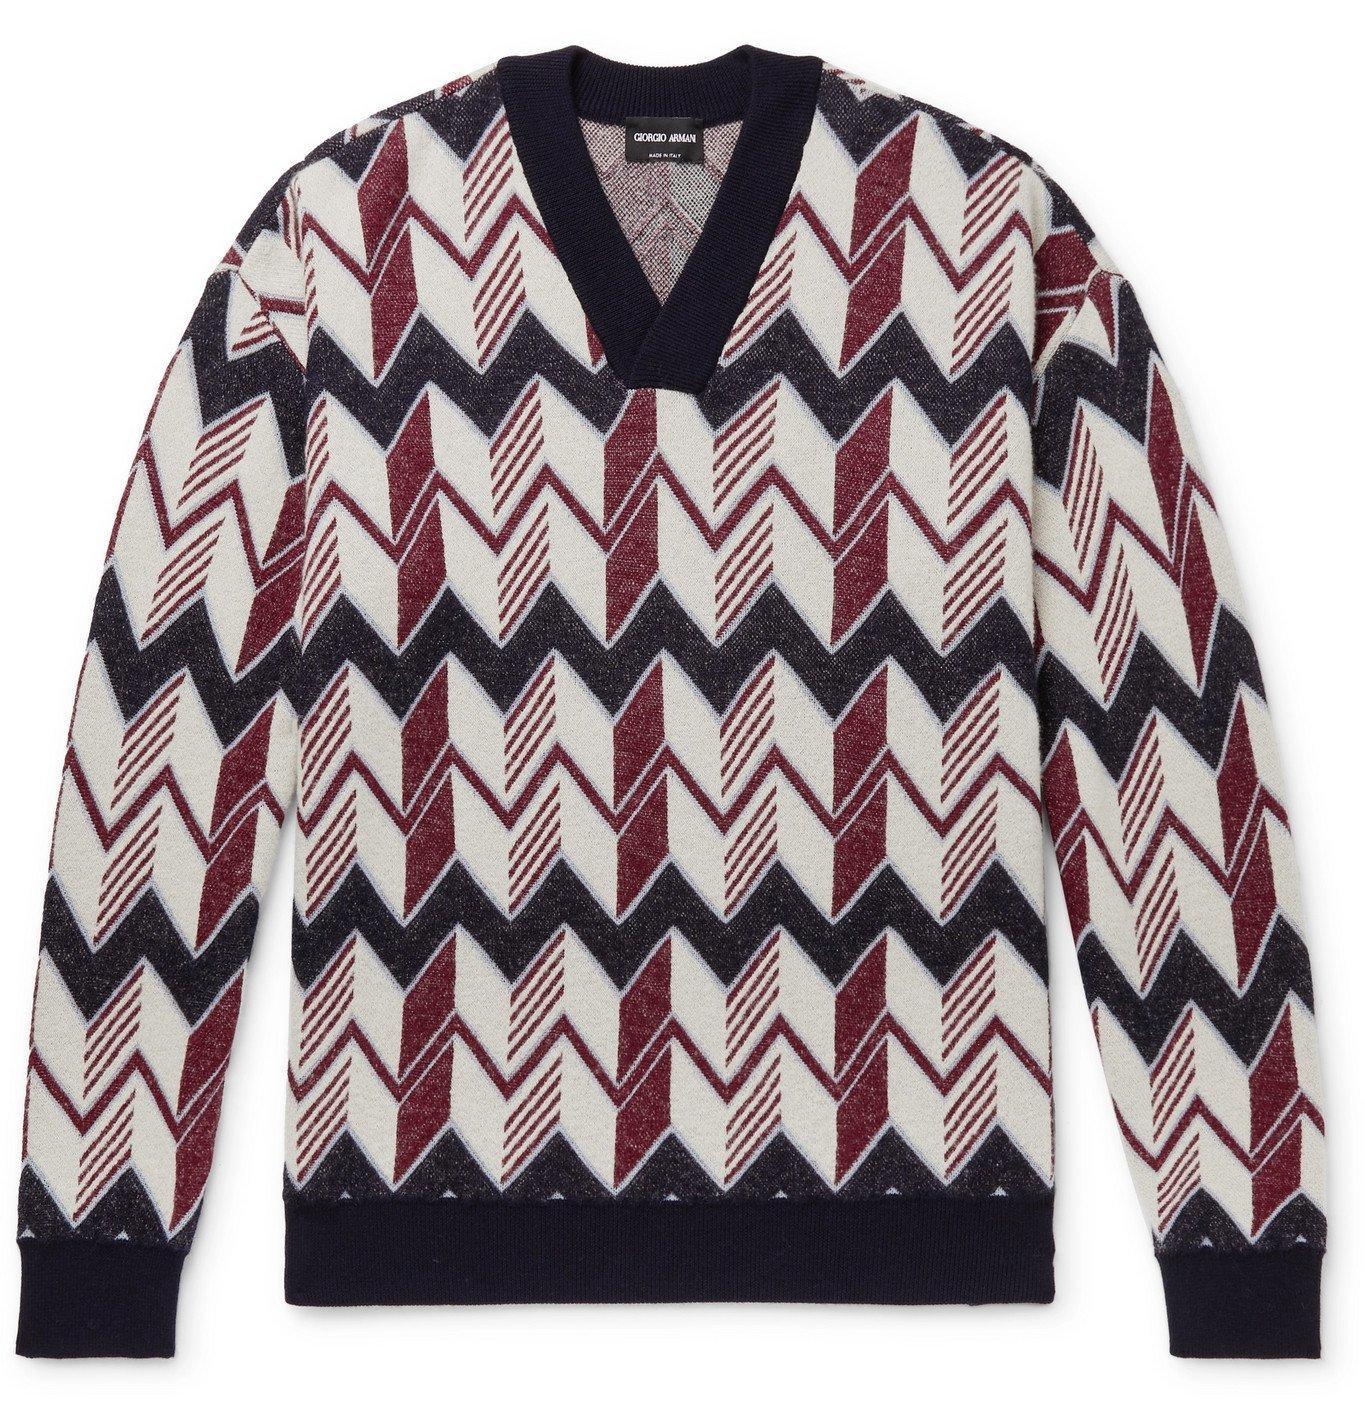 Giorgio Armani - Jacquard-Knit Sweater - Red